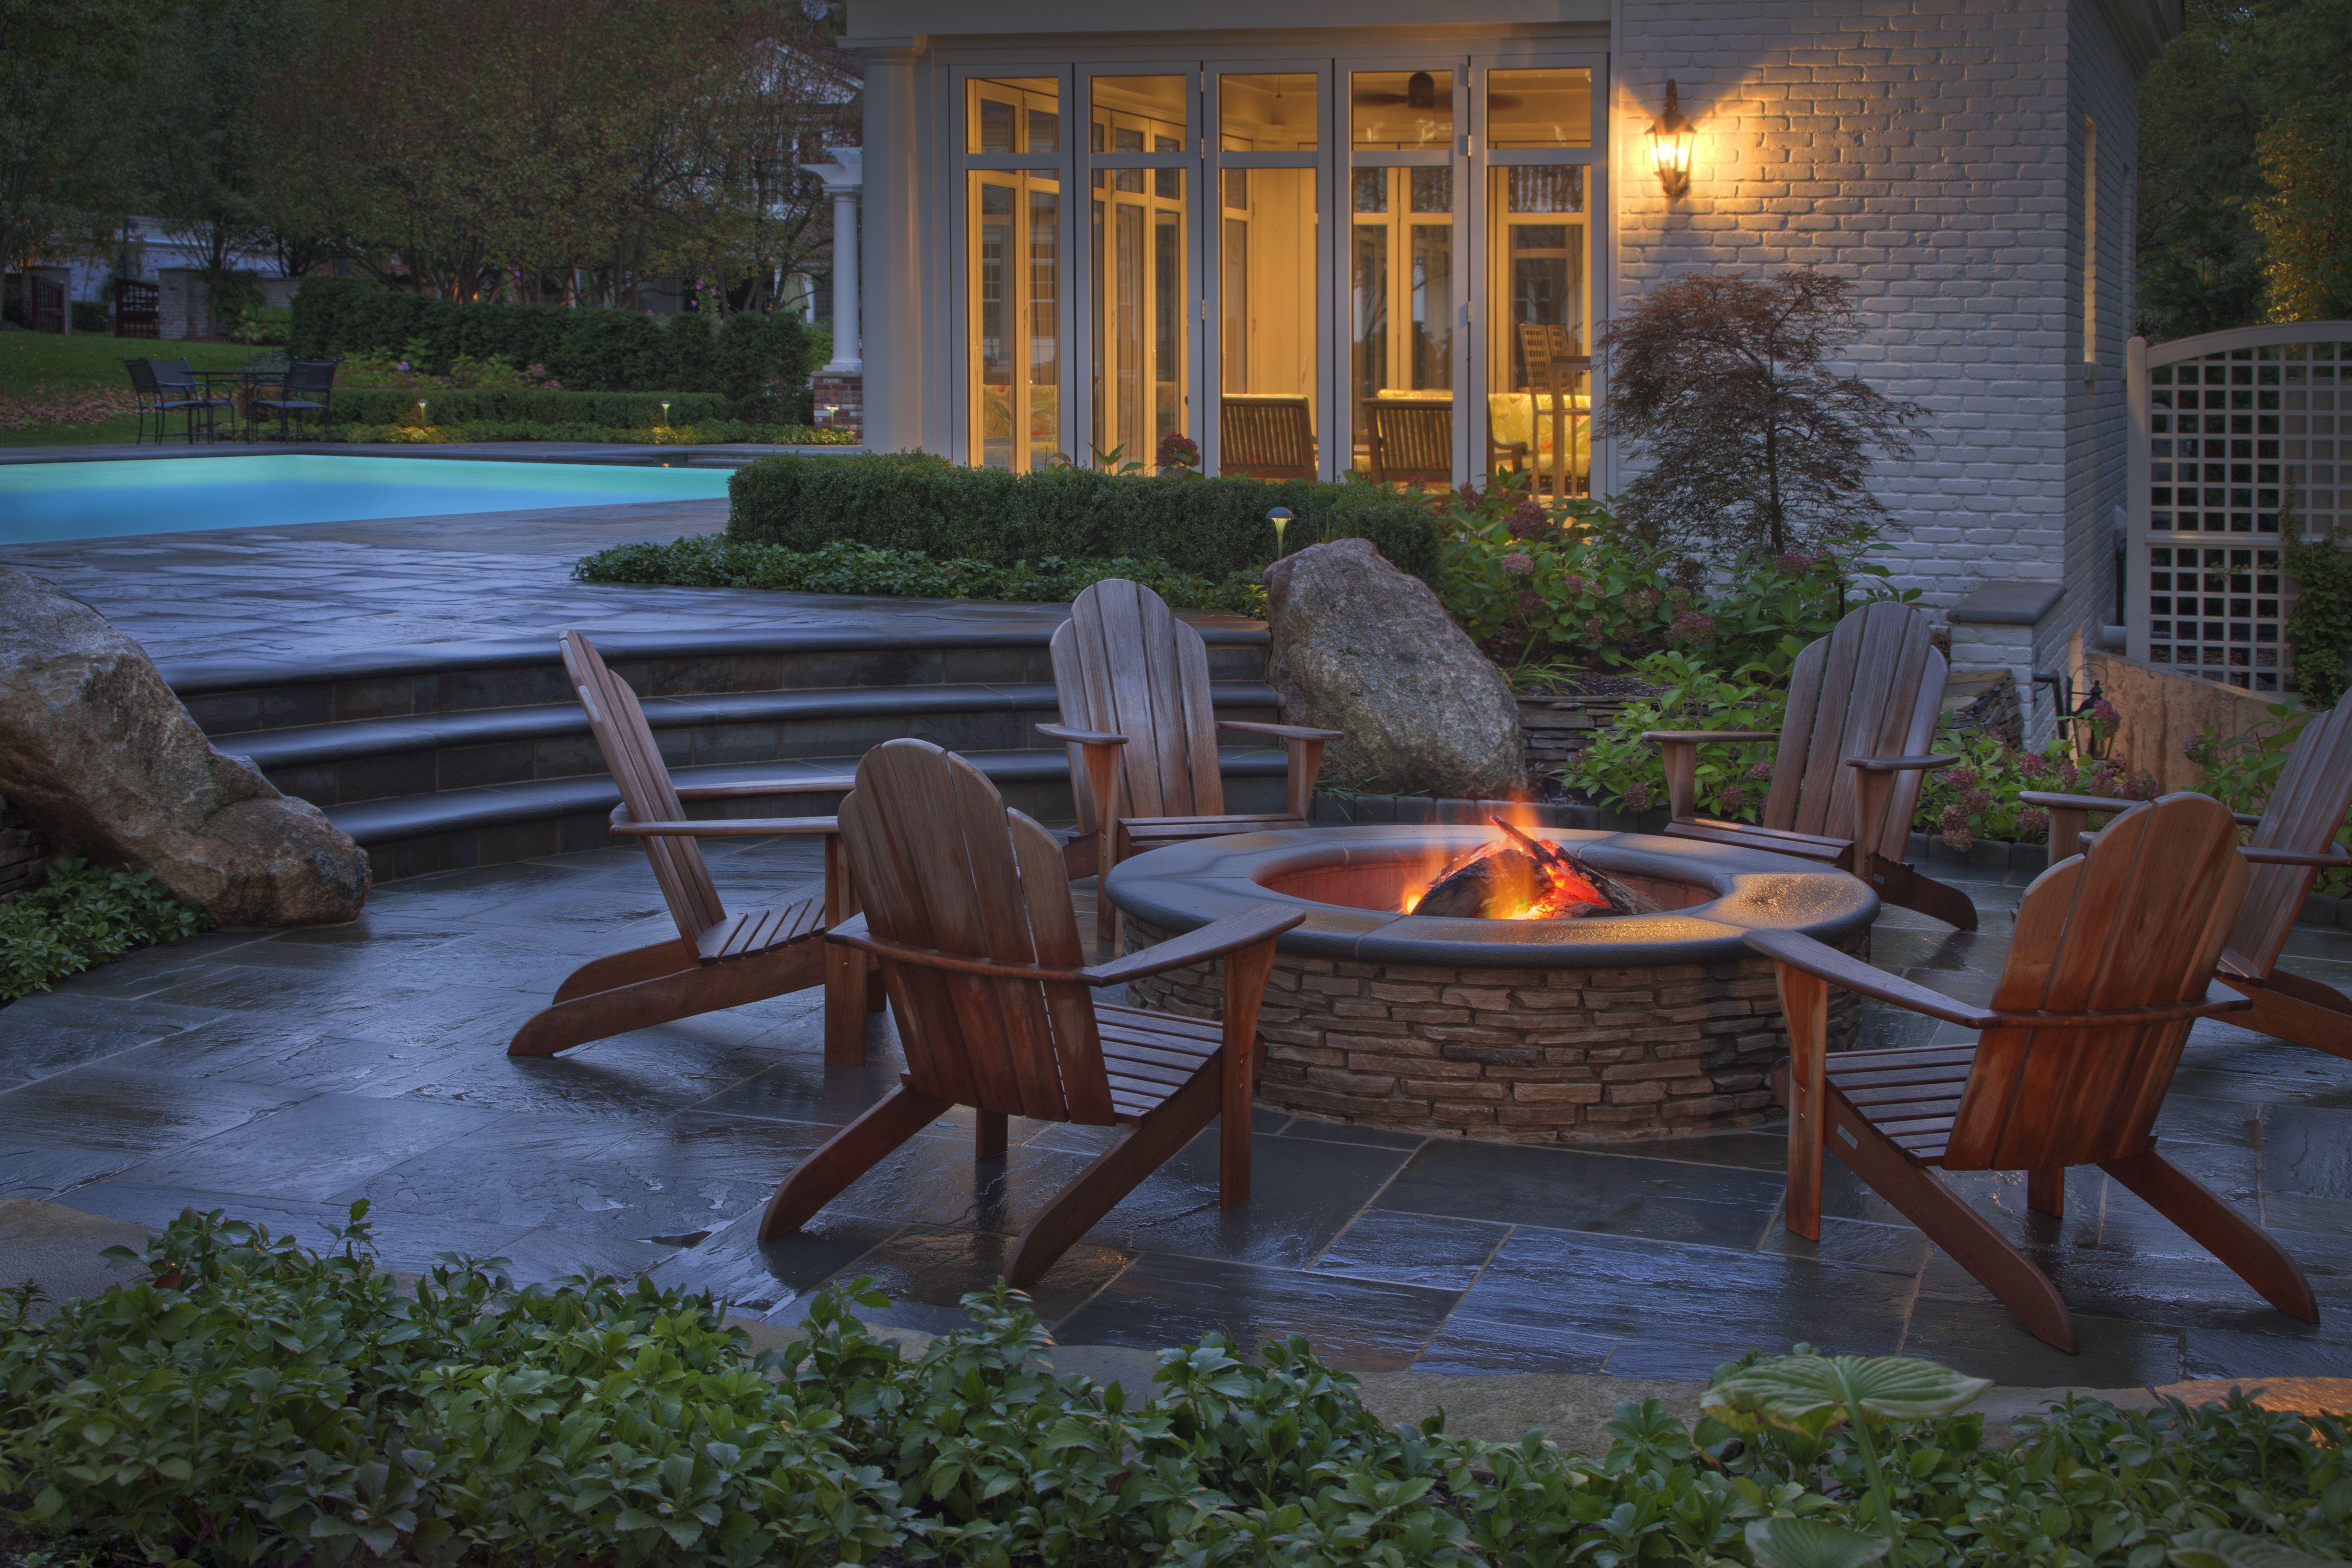 fire pit in backyard photo - 1